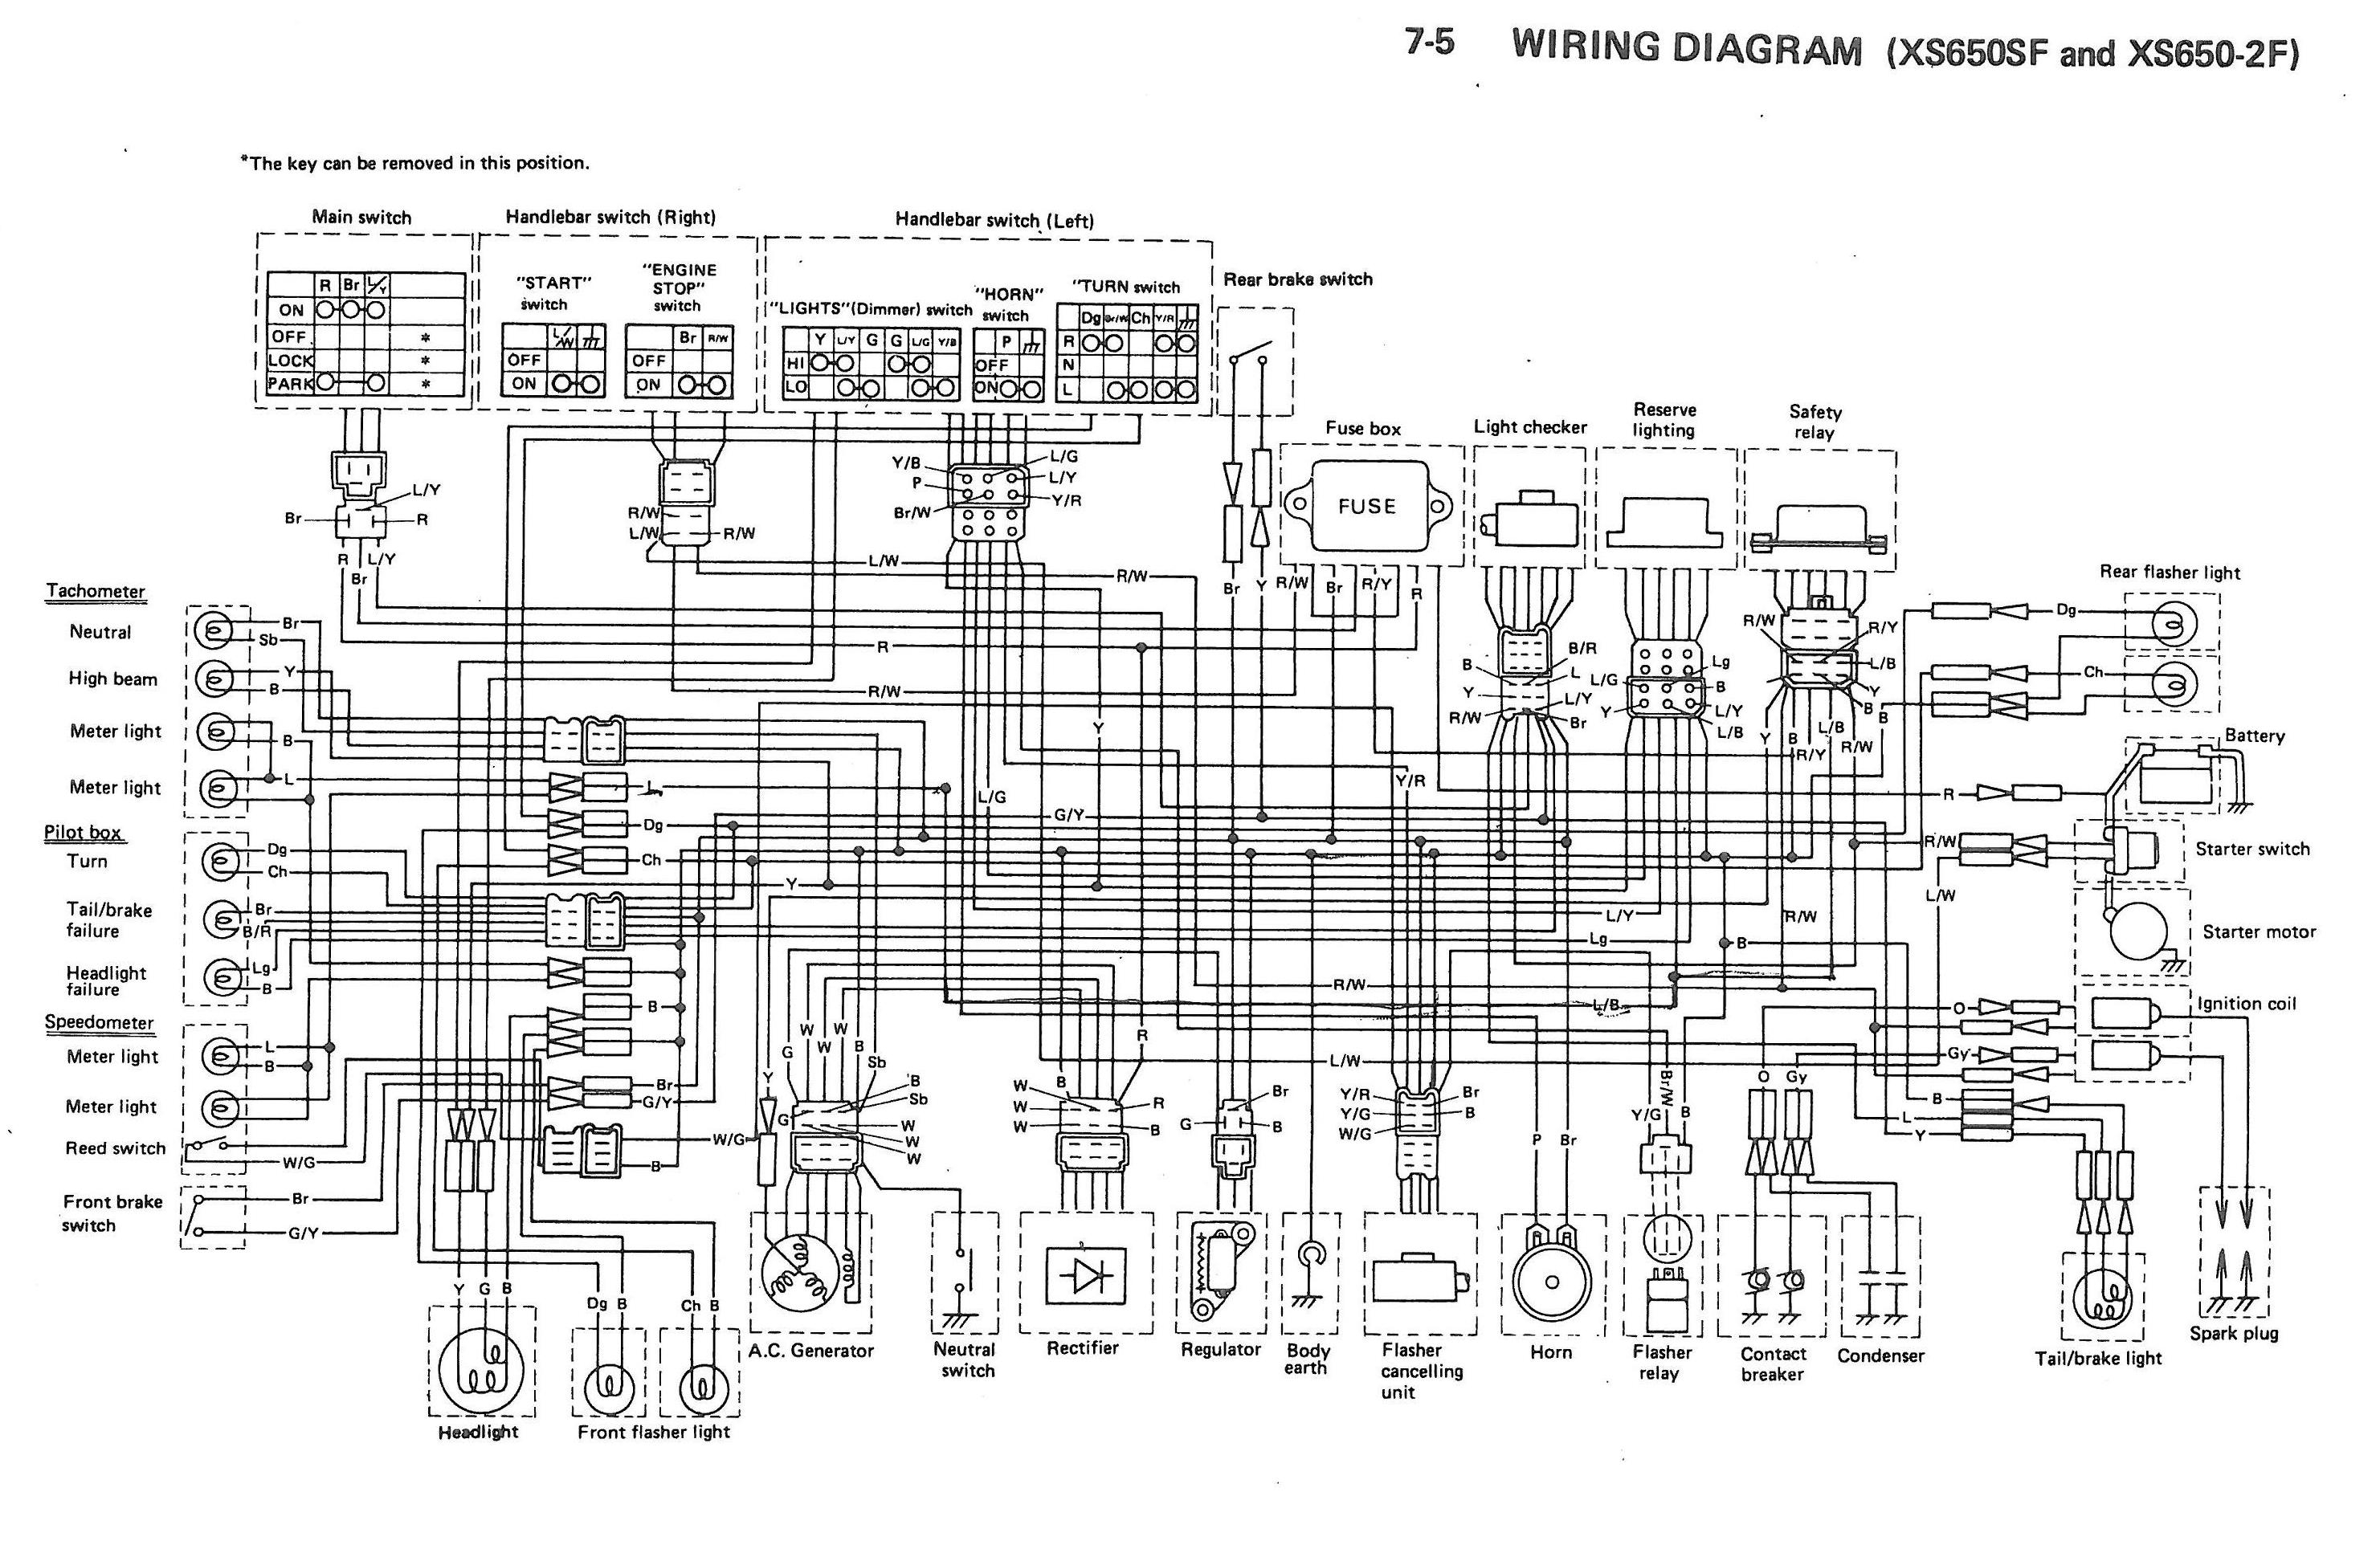 Xs650: 79 Xs650Sf/2F Wiring Diagrams | Thexscafe - Xs650 Wiring Diagram